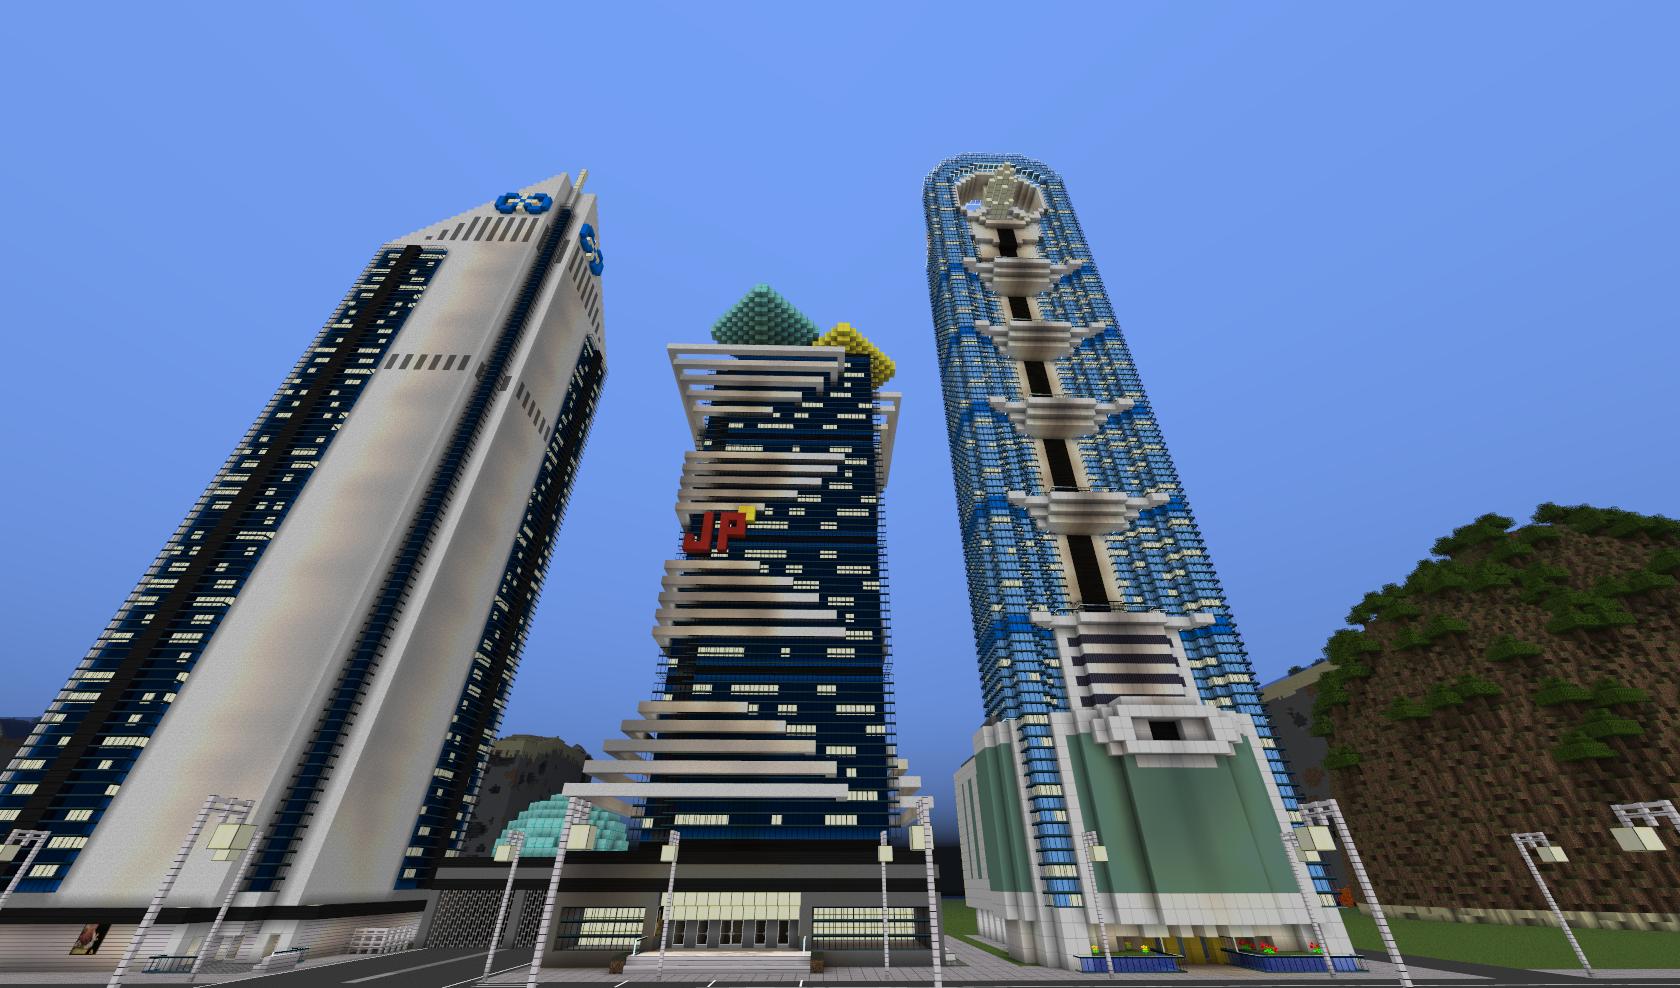 Map-ville-newcraft-vecter-city-minecraft-building